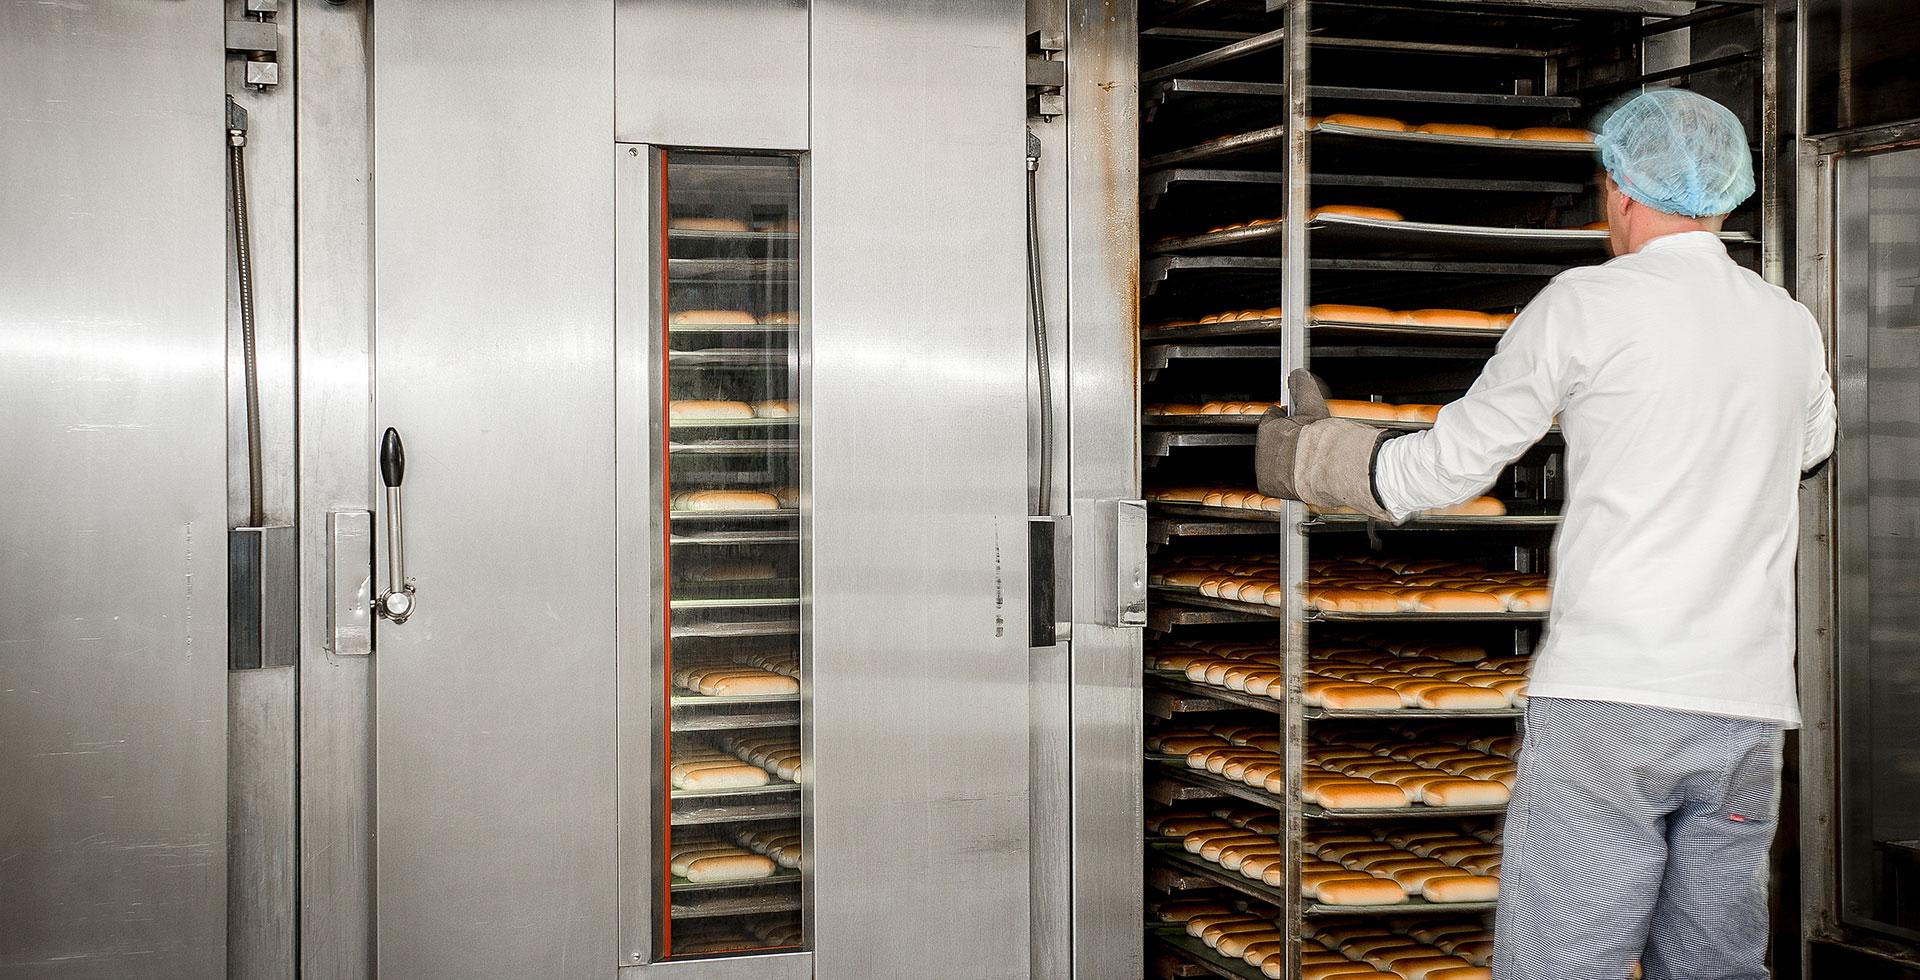 Oven First Class Bakery